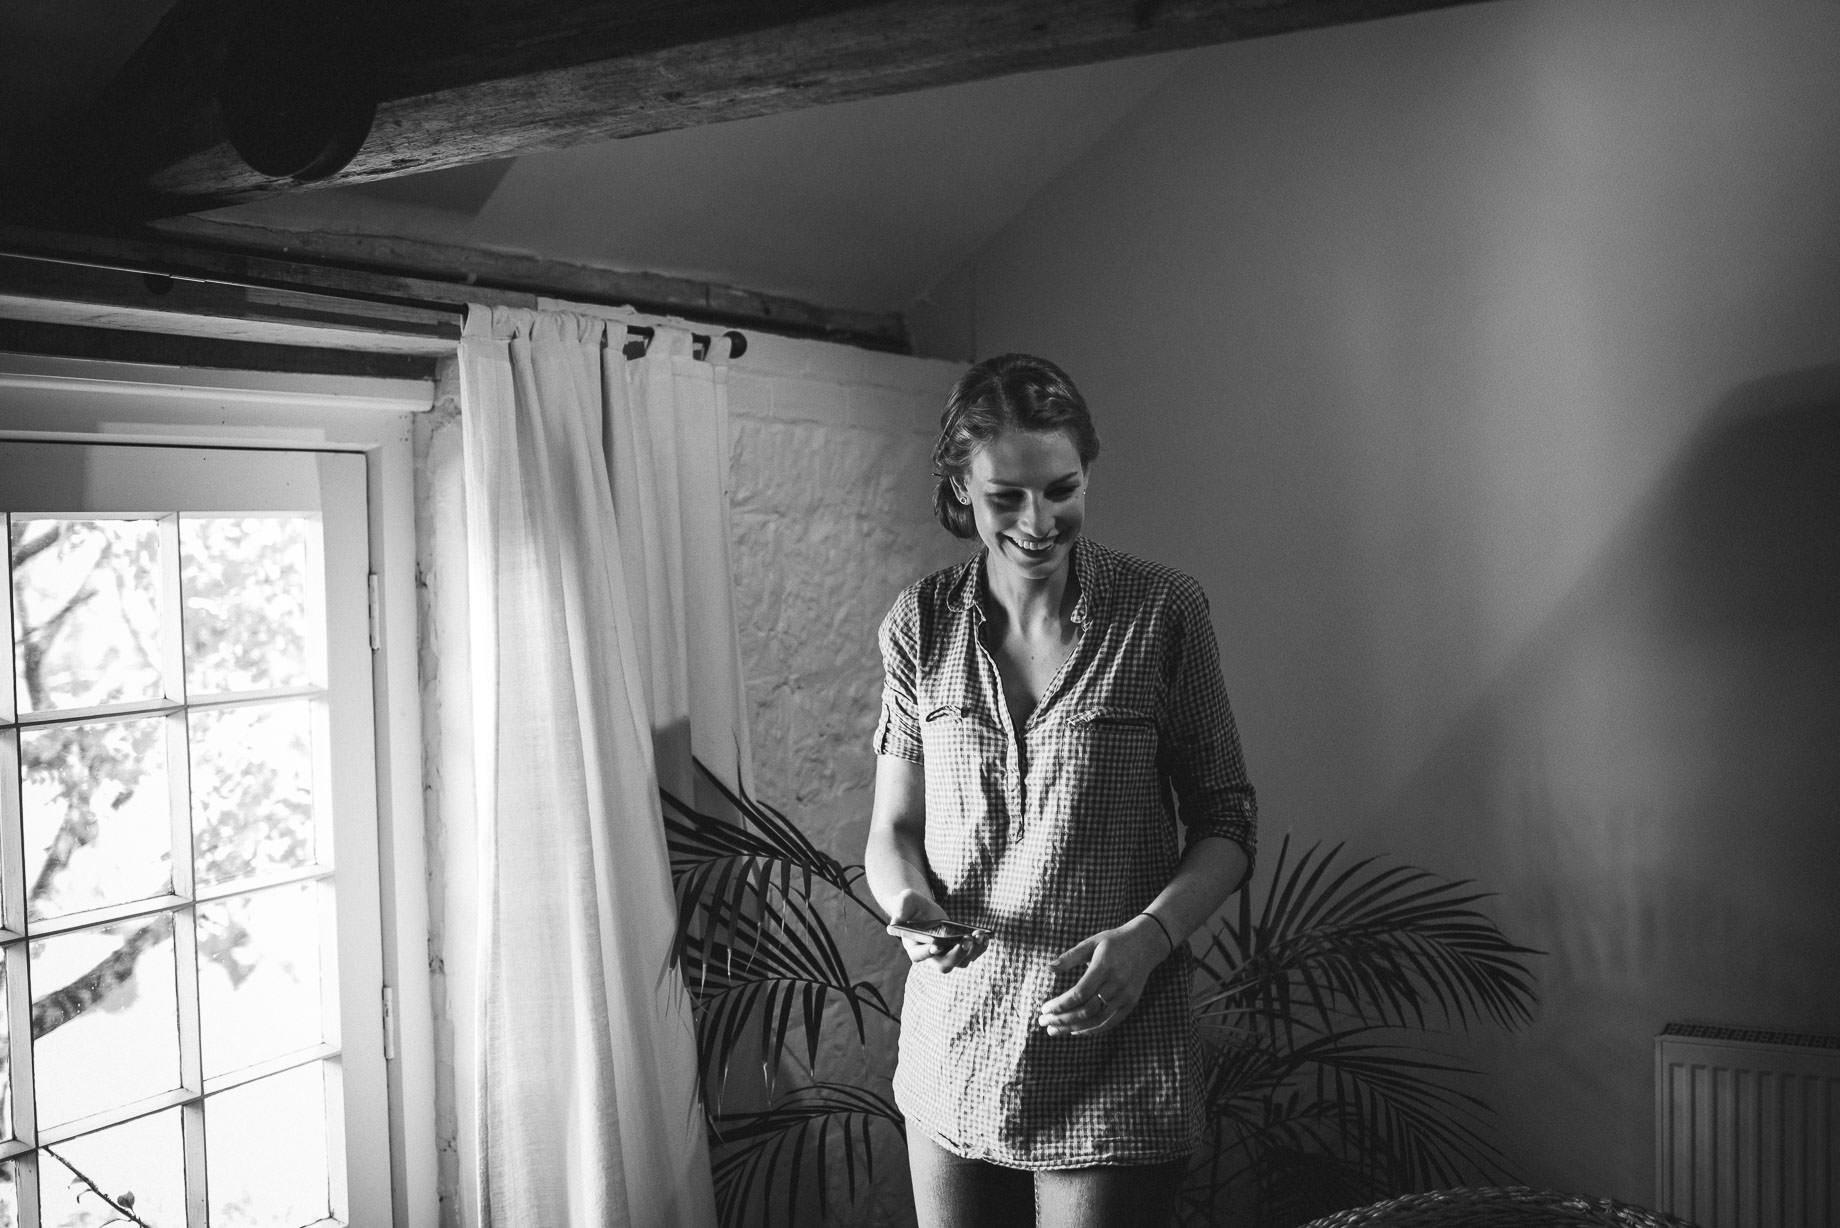 bury-court-barn-wedding-photography-guy-collier-photography-nadia-tom-18-of-184